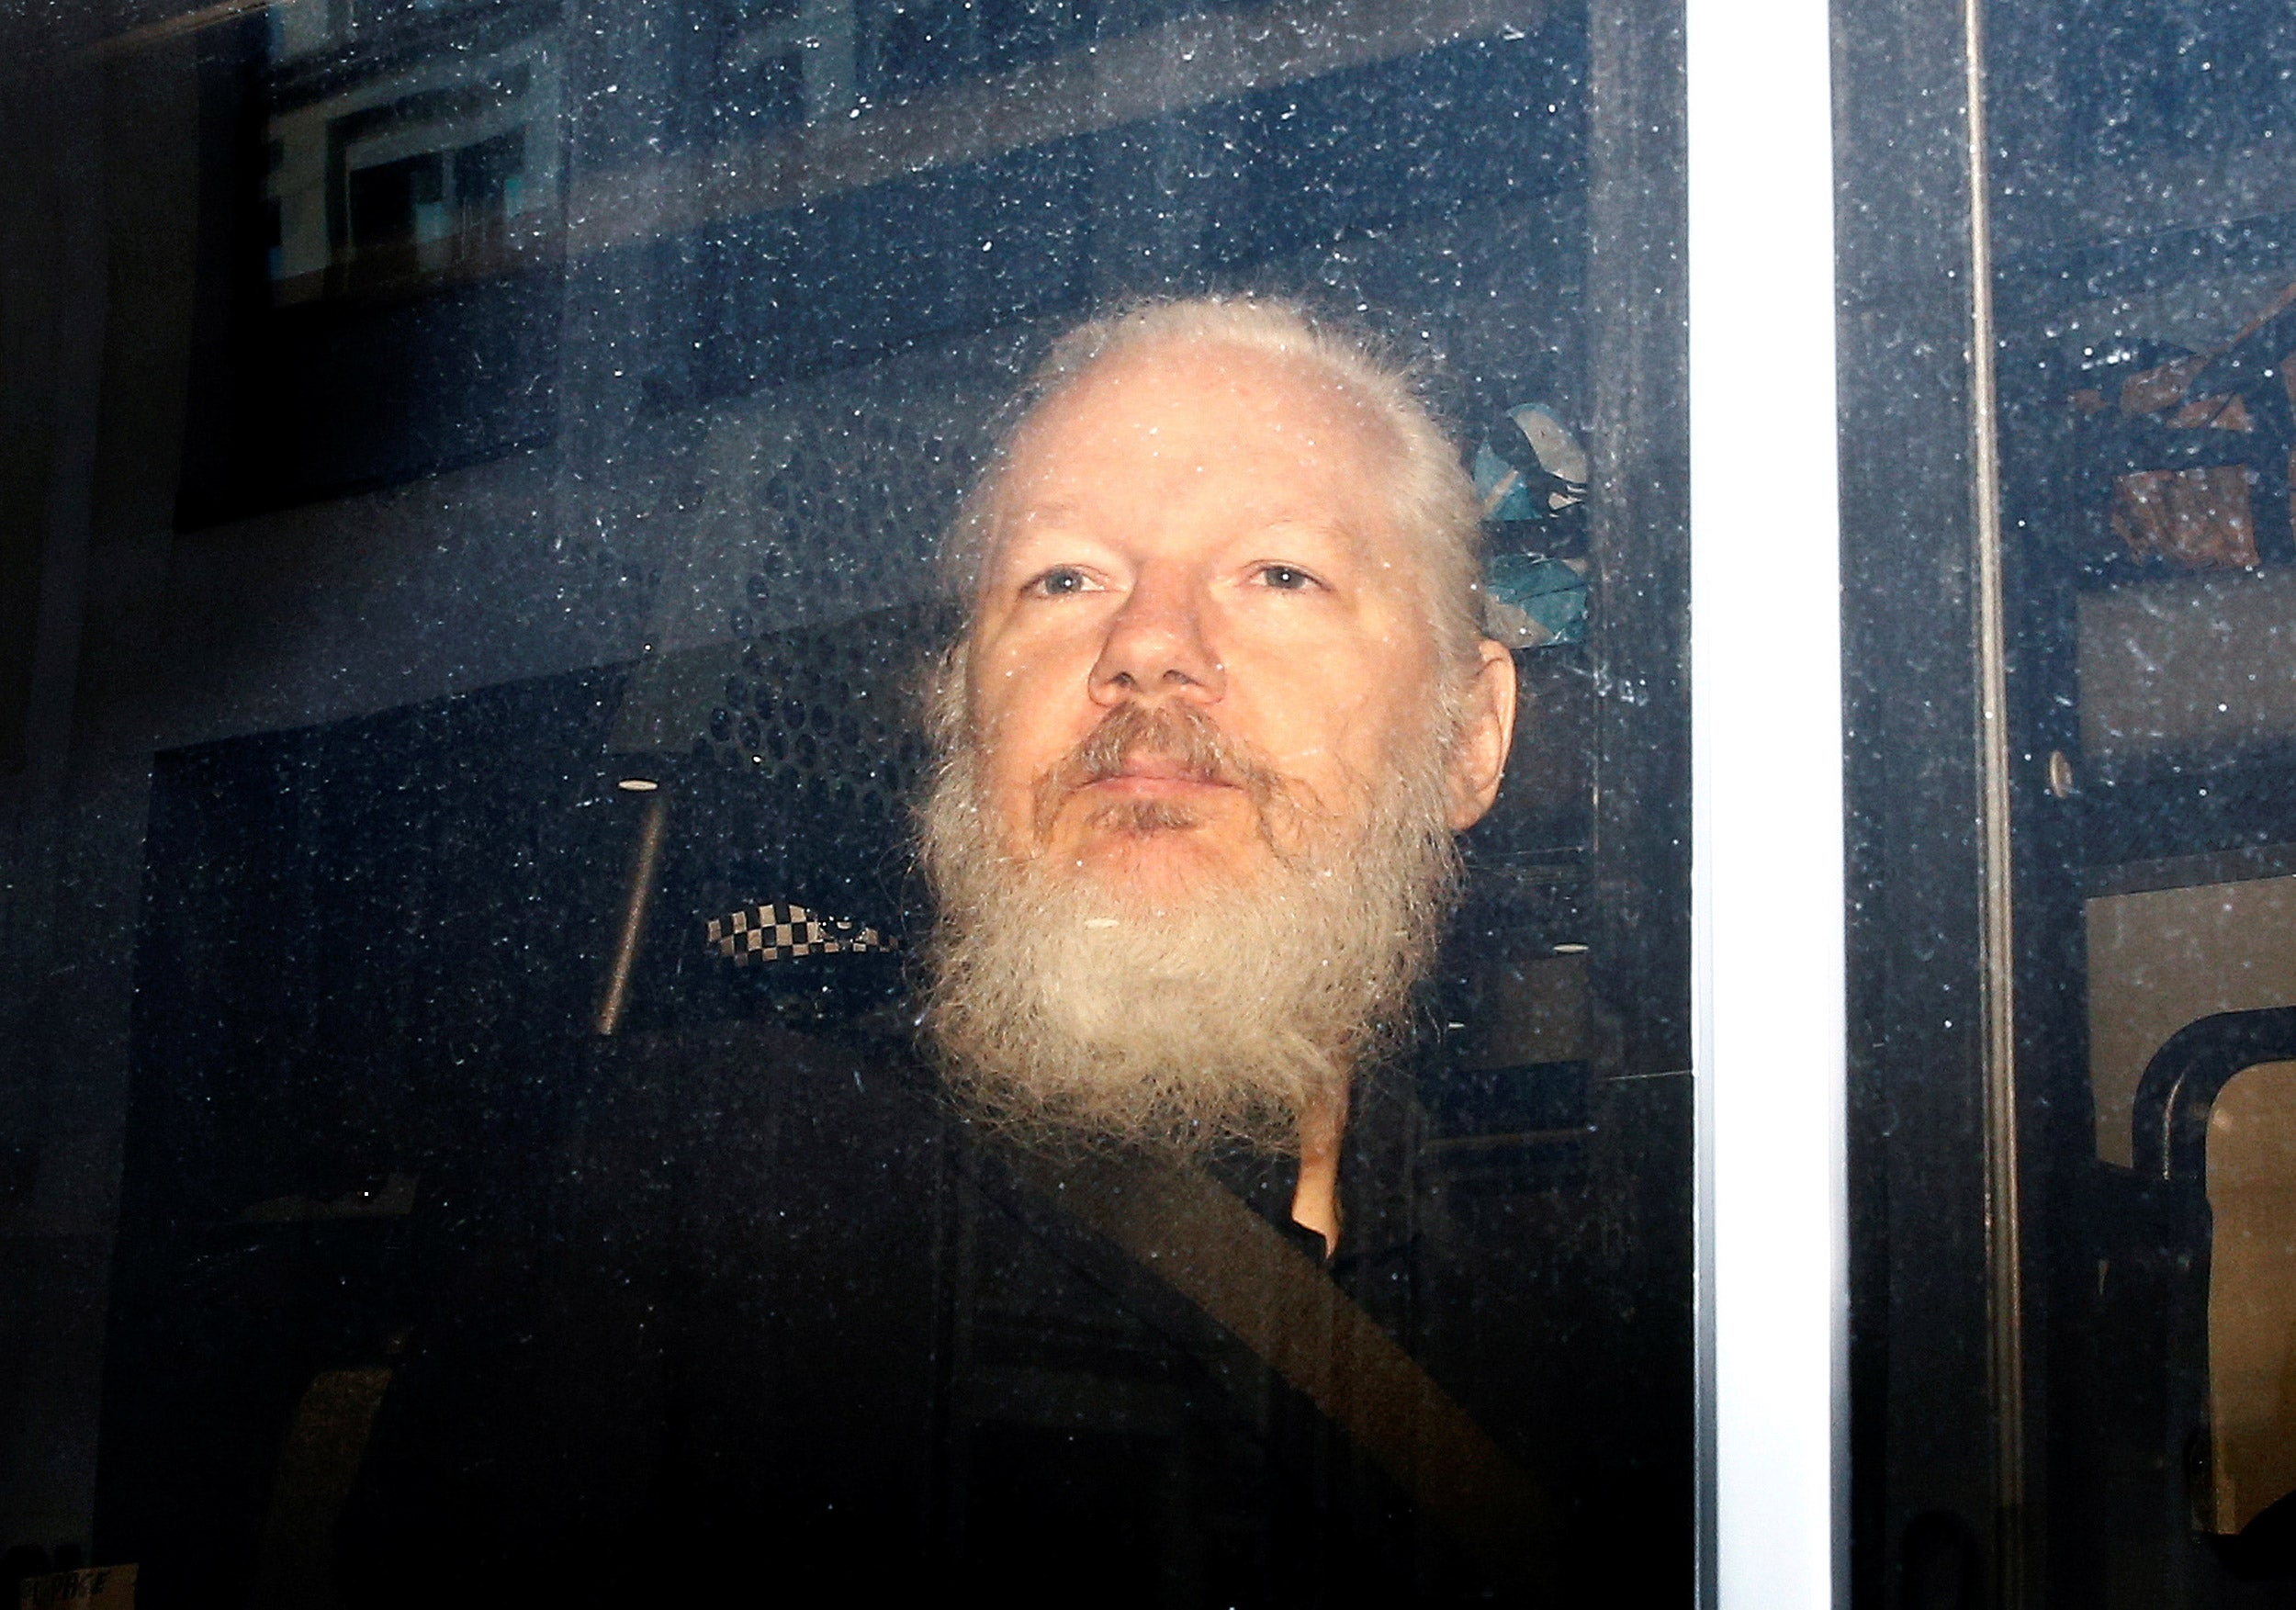 Julian Assange in a police van.